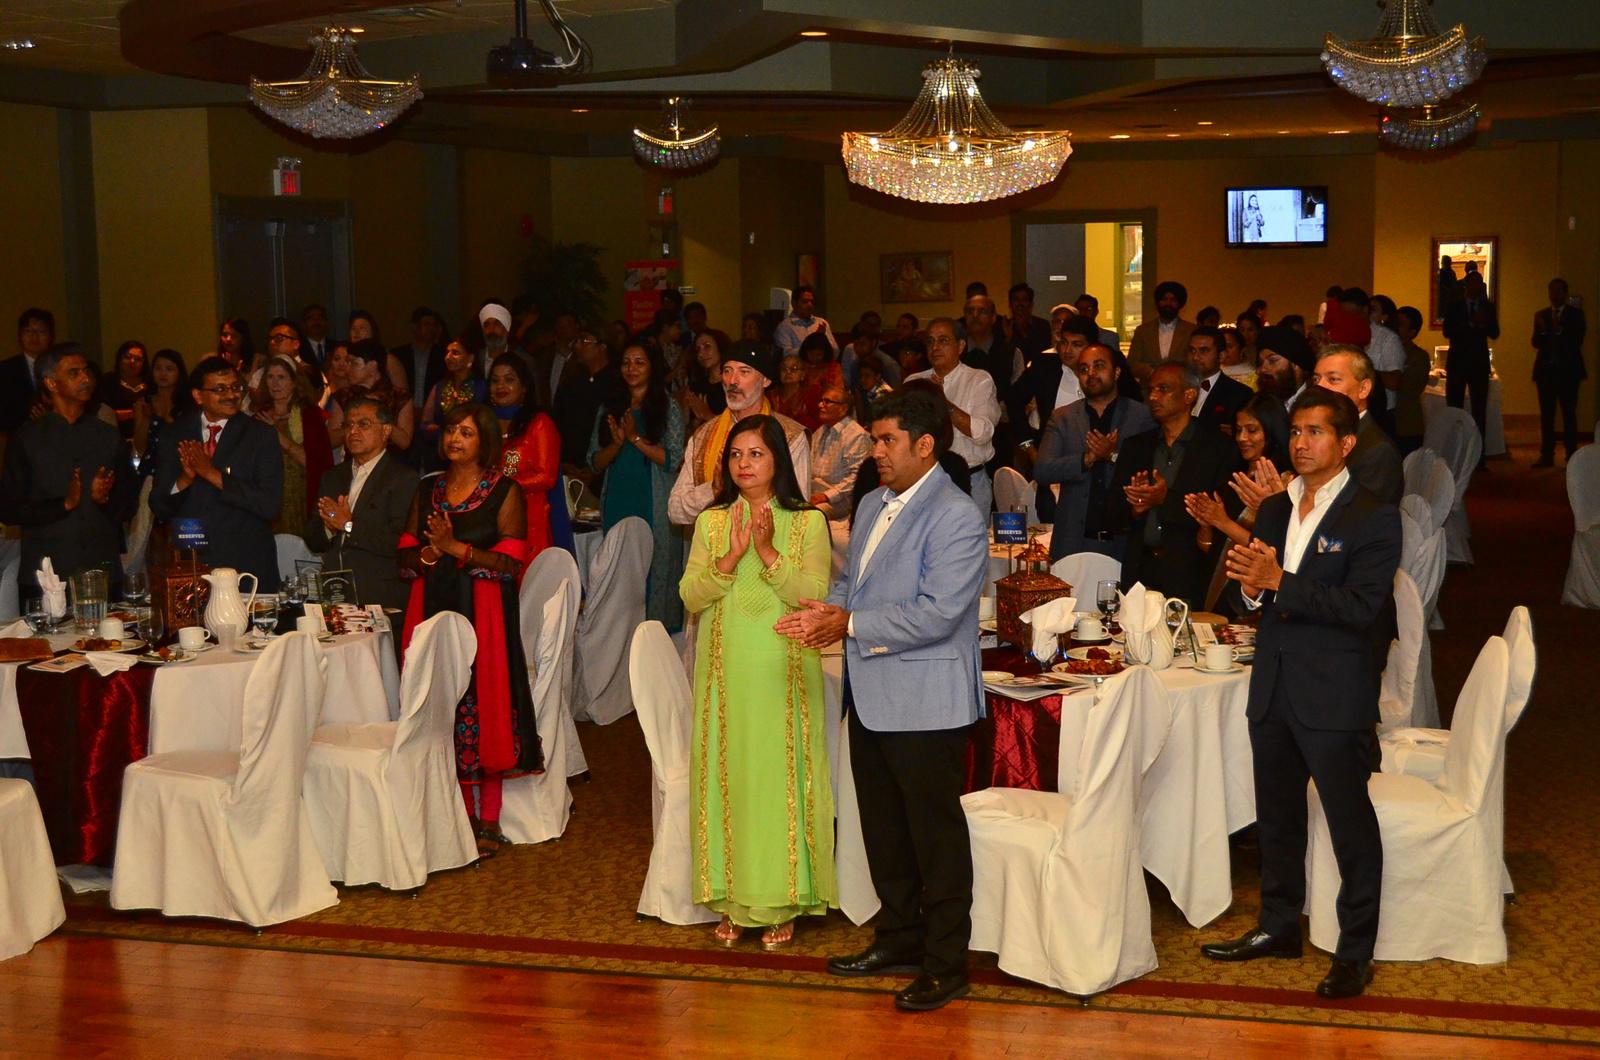 Evening event at Krystal Banquet Surrey